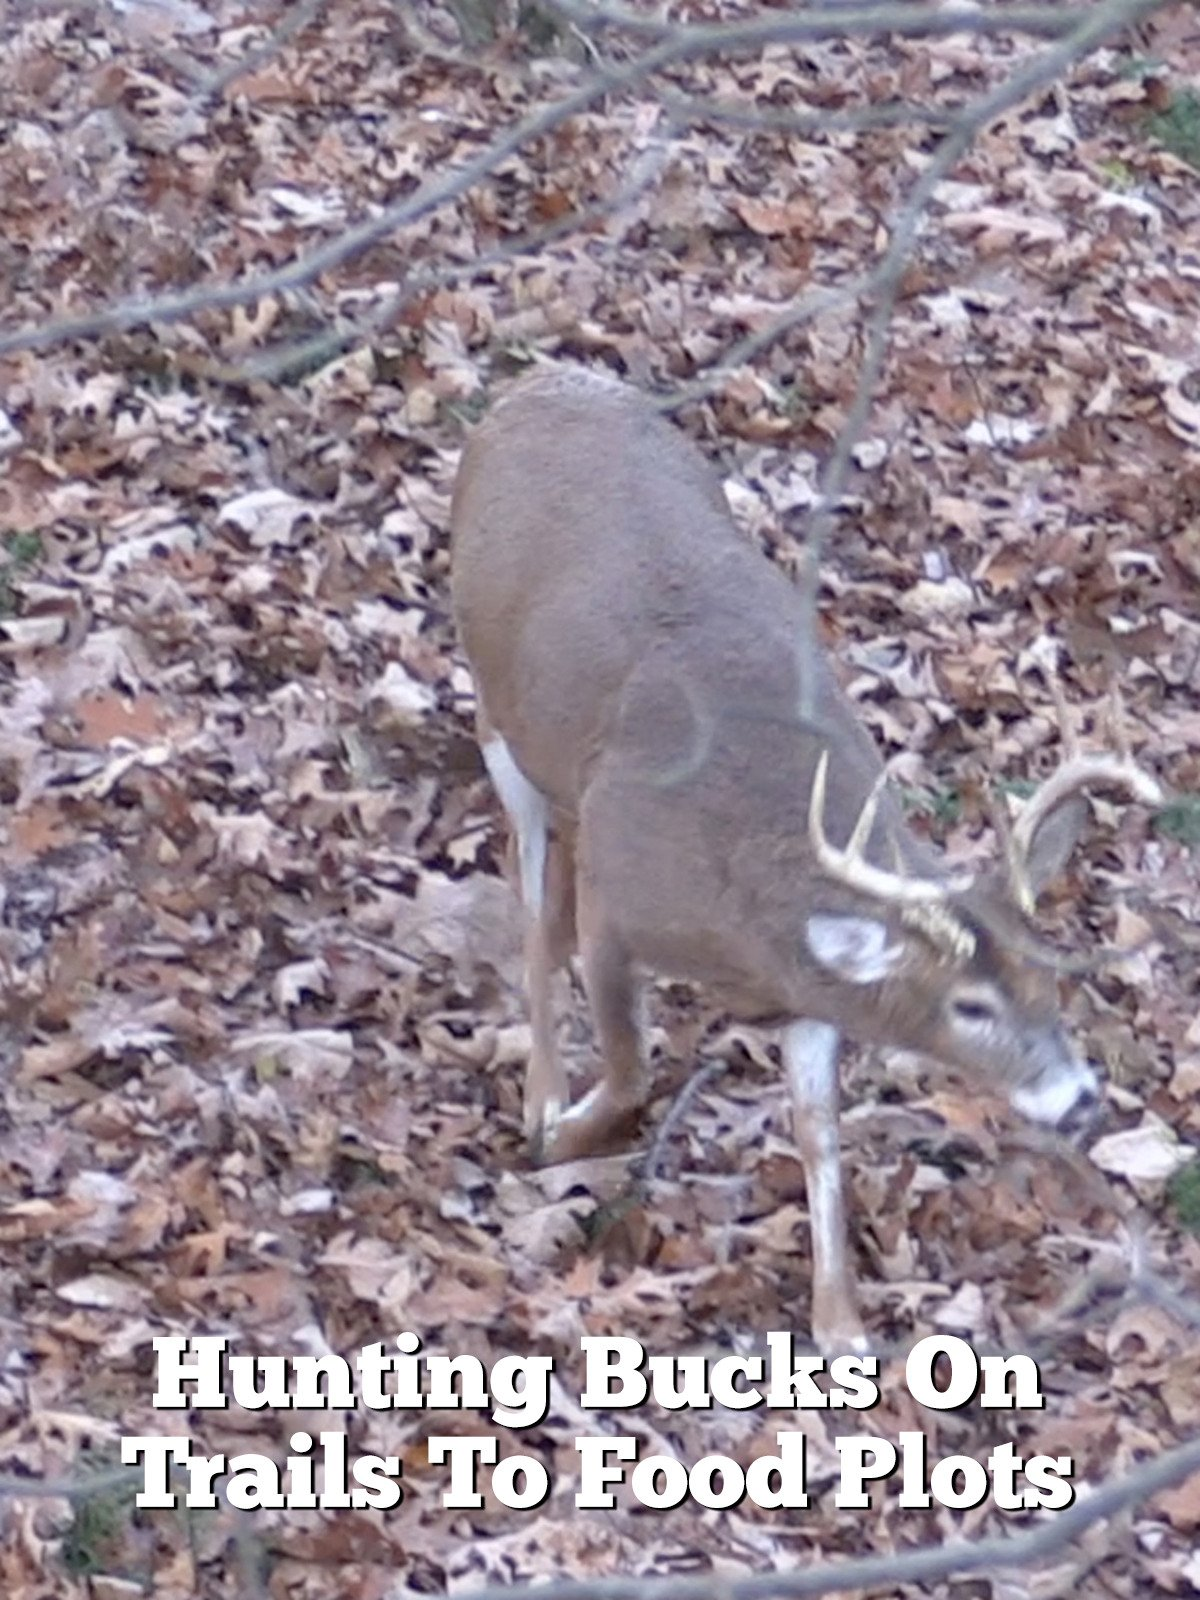 Hunting Bucks On Trails To Food Plots